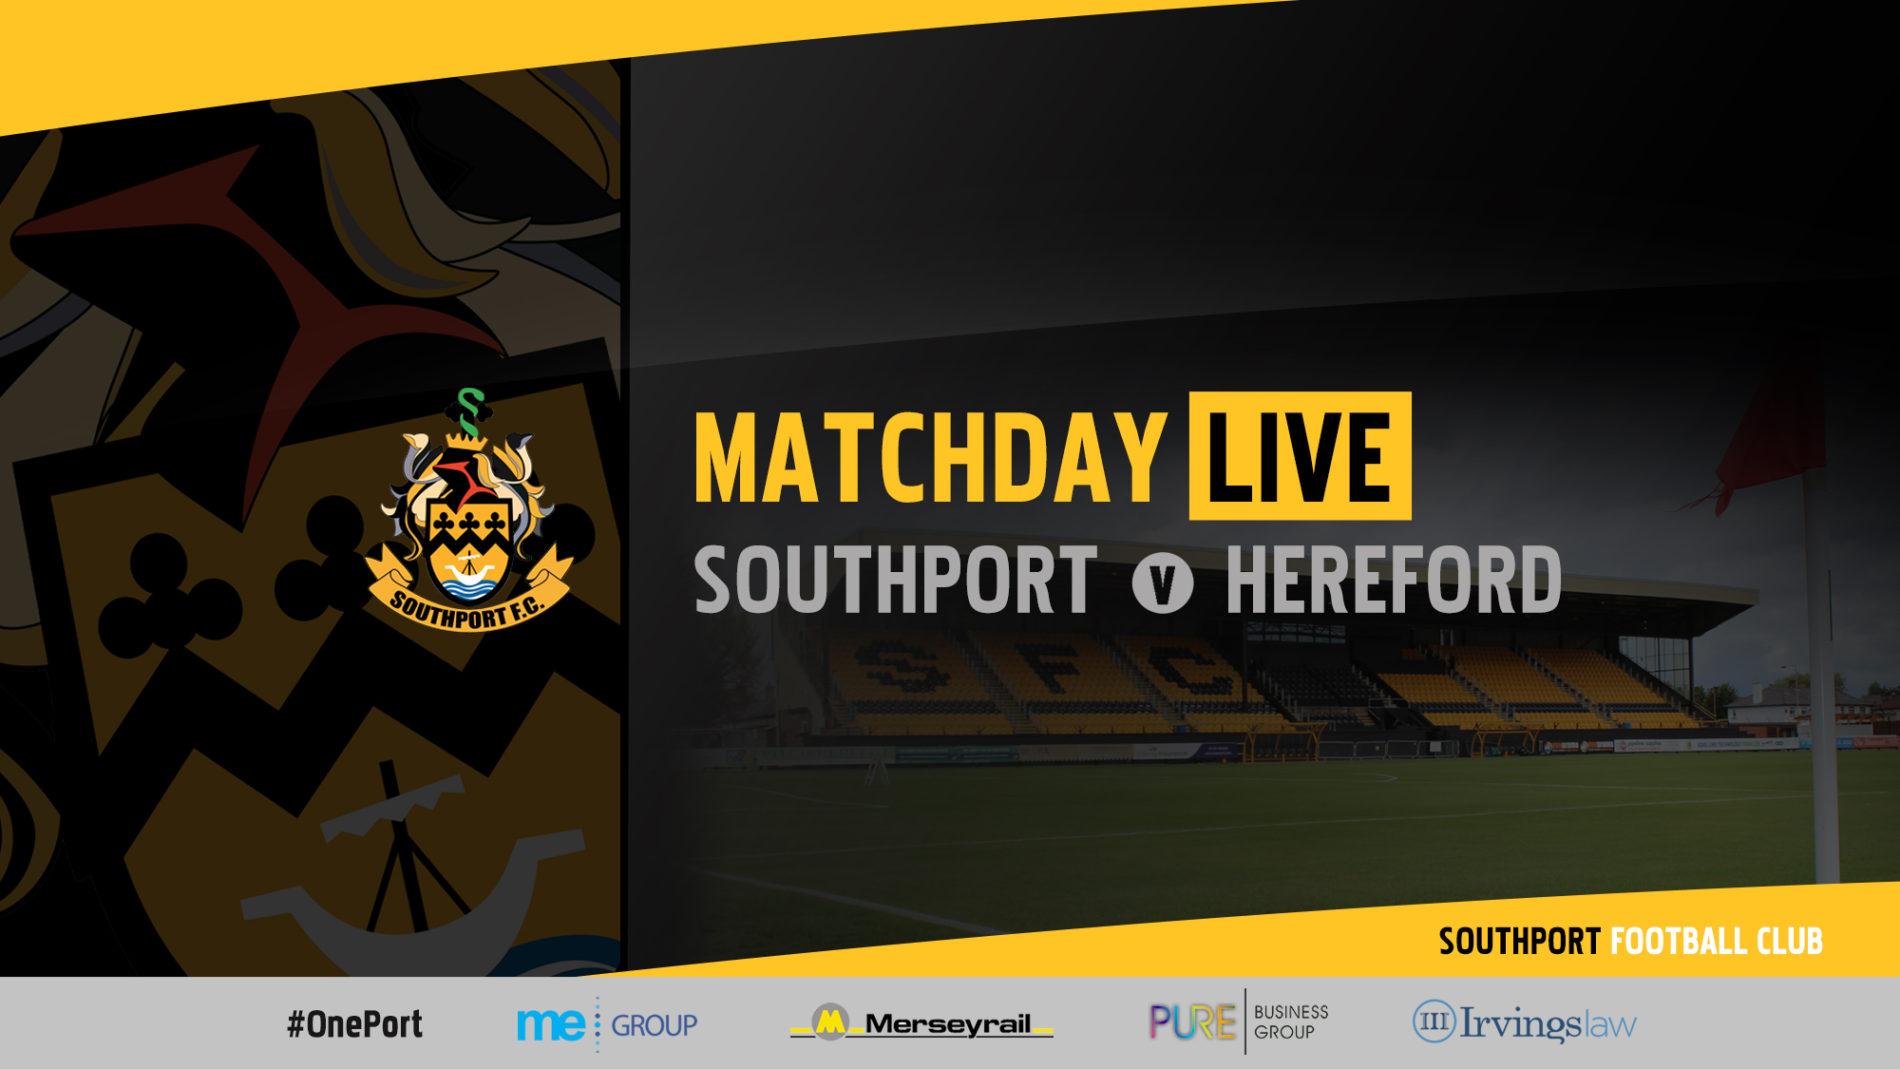 MATCHDAY LIVE | Southport v Hereford